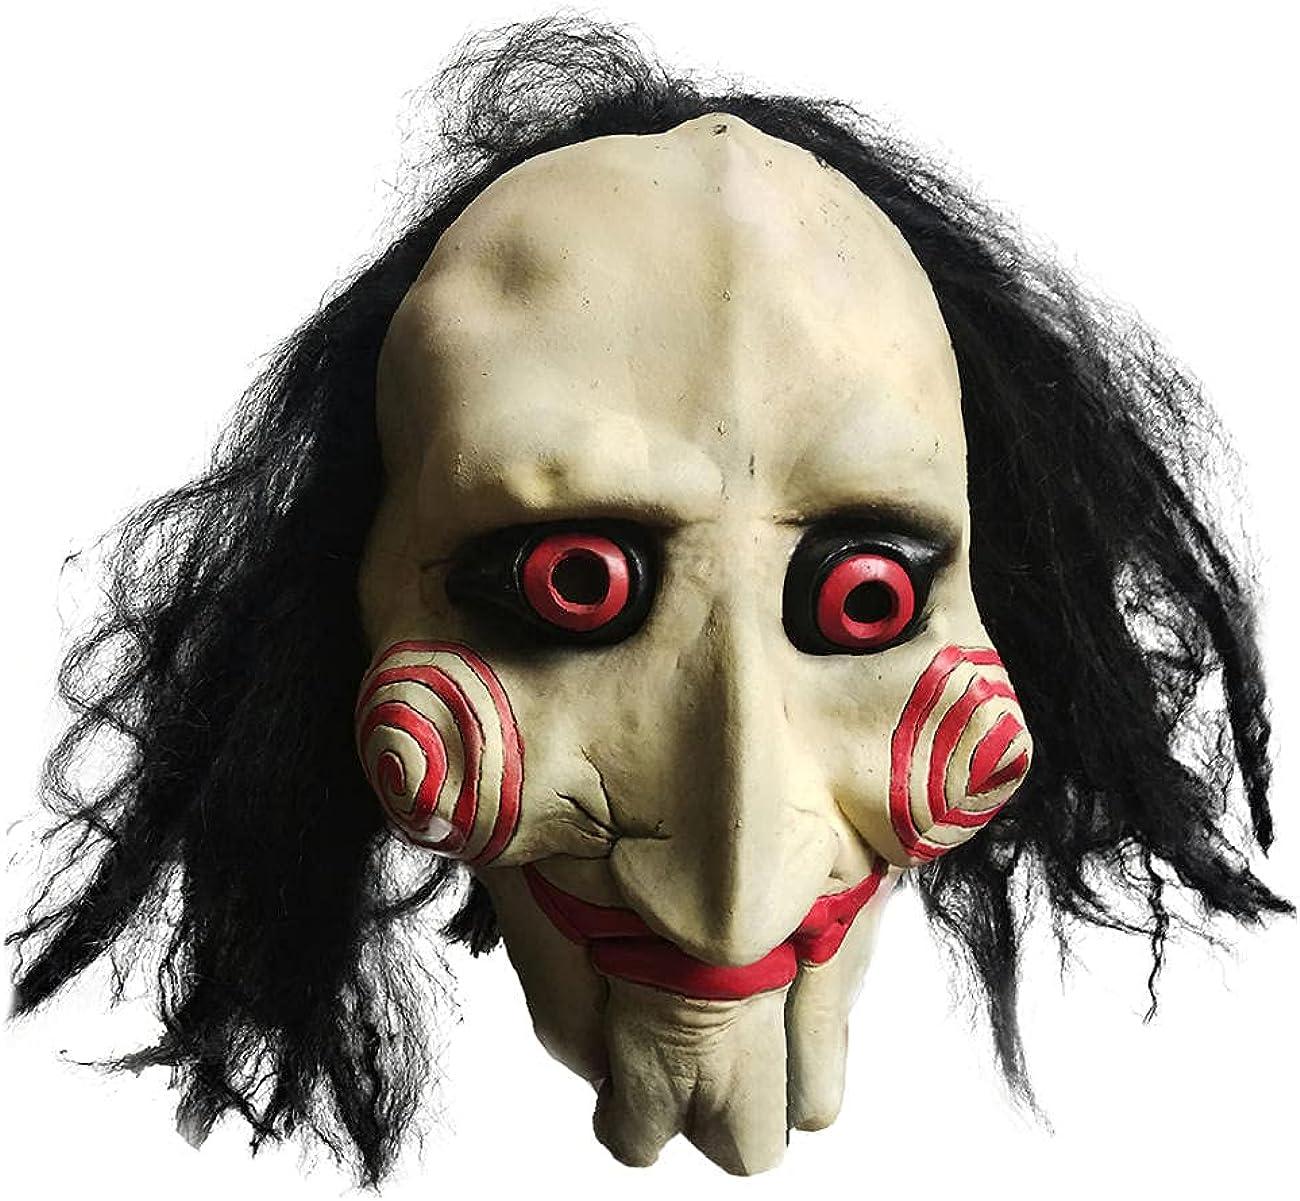 Máscara de Halloween Máscara de Terror Festival Fantasma Viste a Fiesta Anual Rendimiento de Pelo Largo Motosierra Madman Máscara